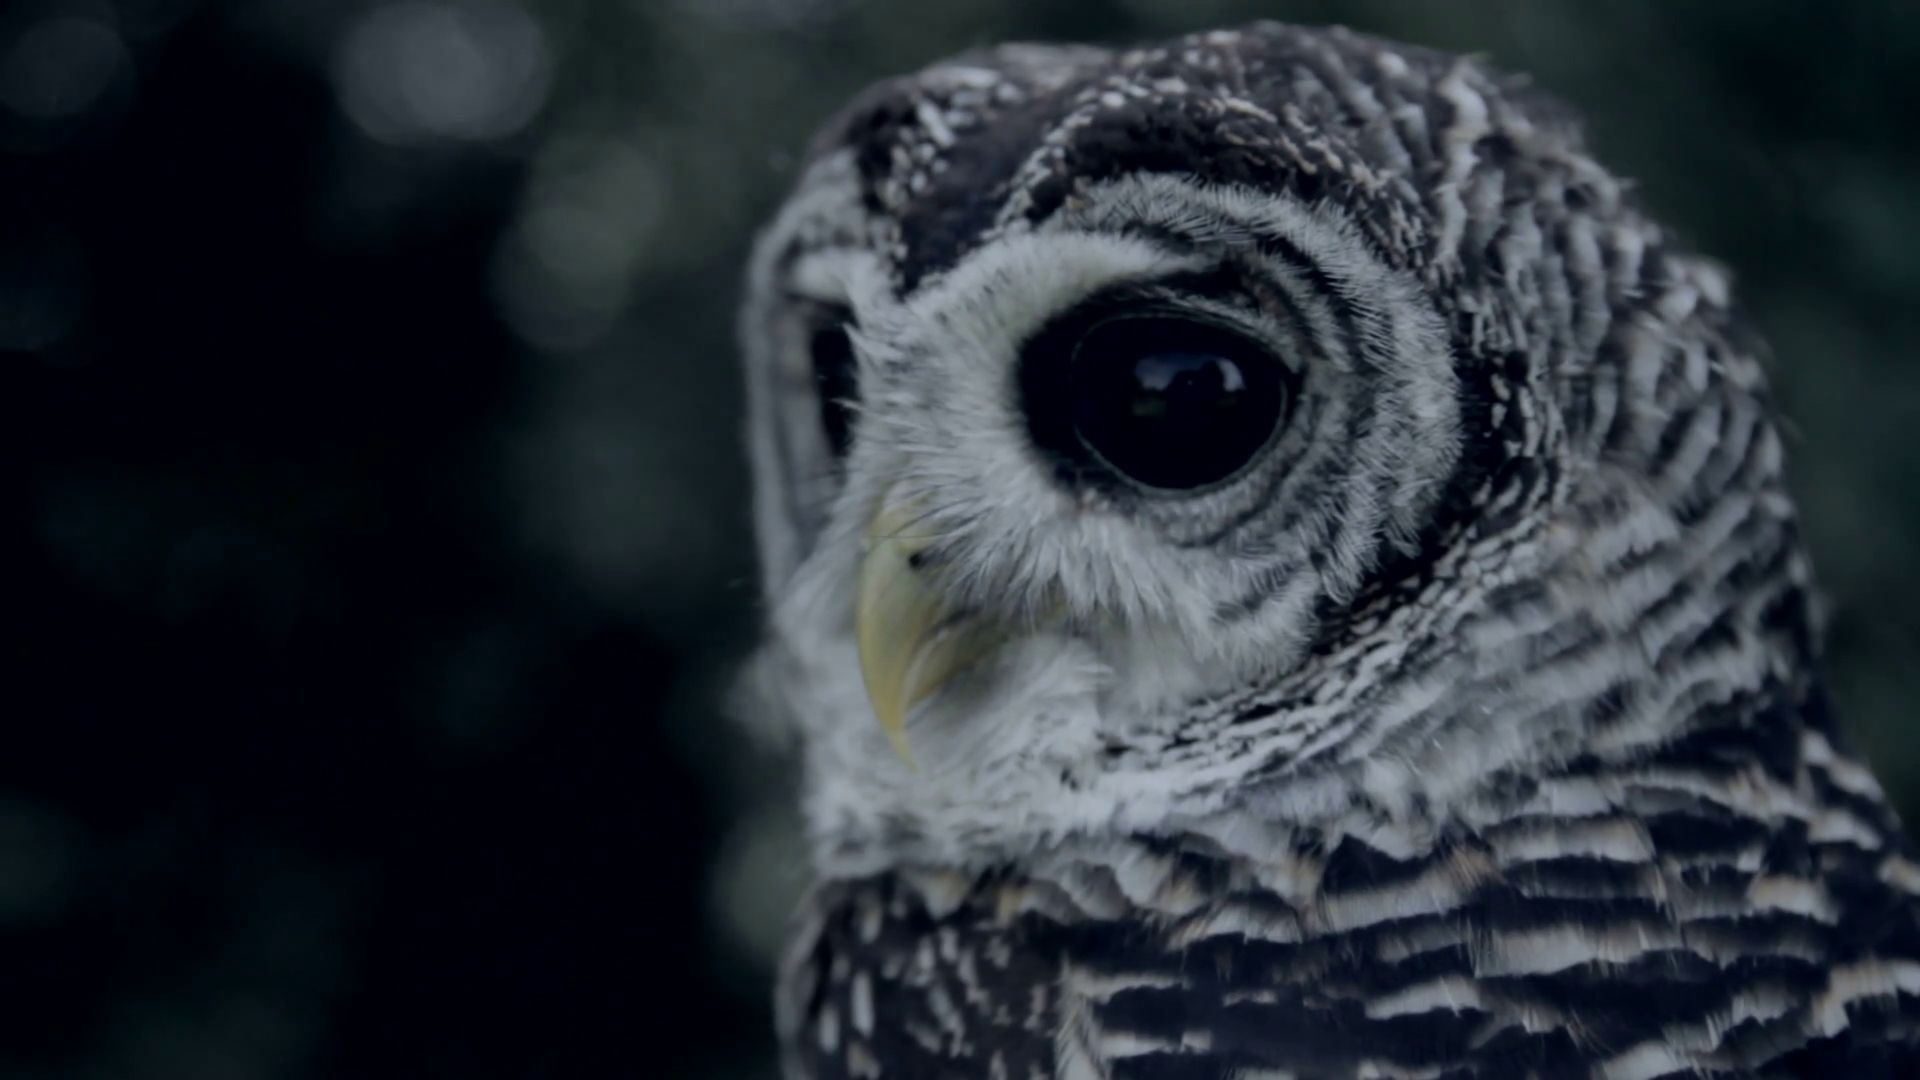 Cute Owl full hd wallpaper for laptop